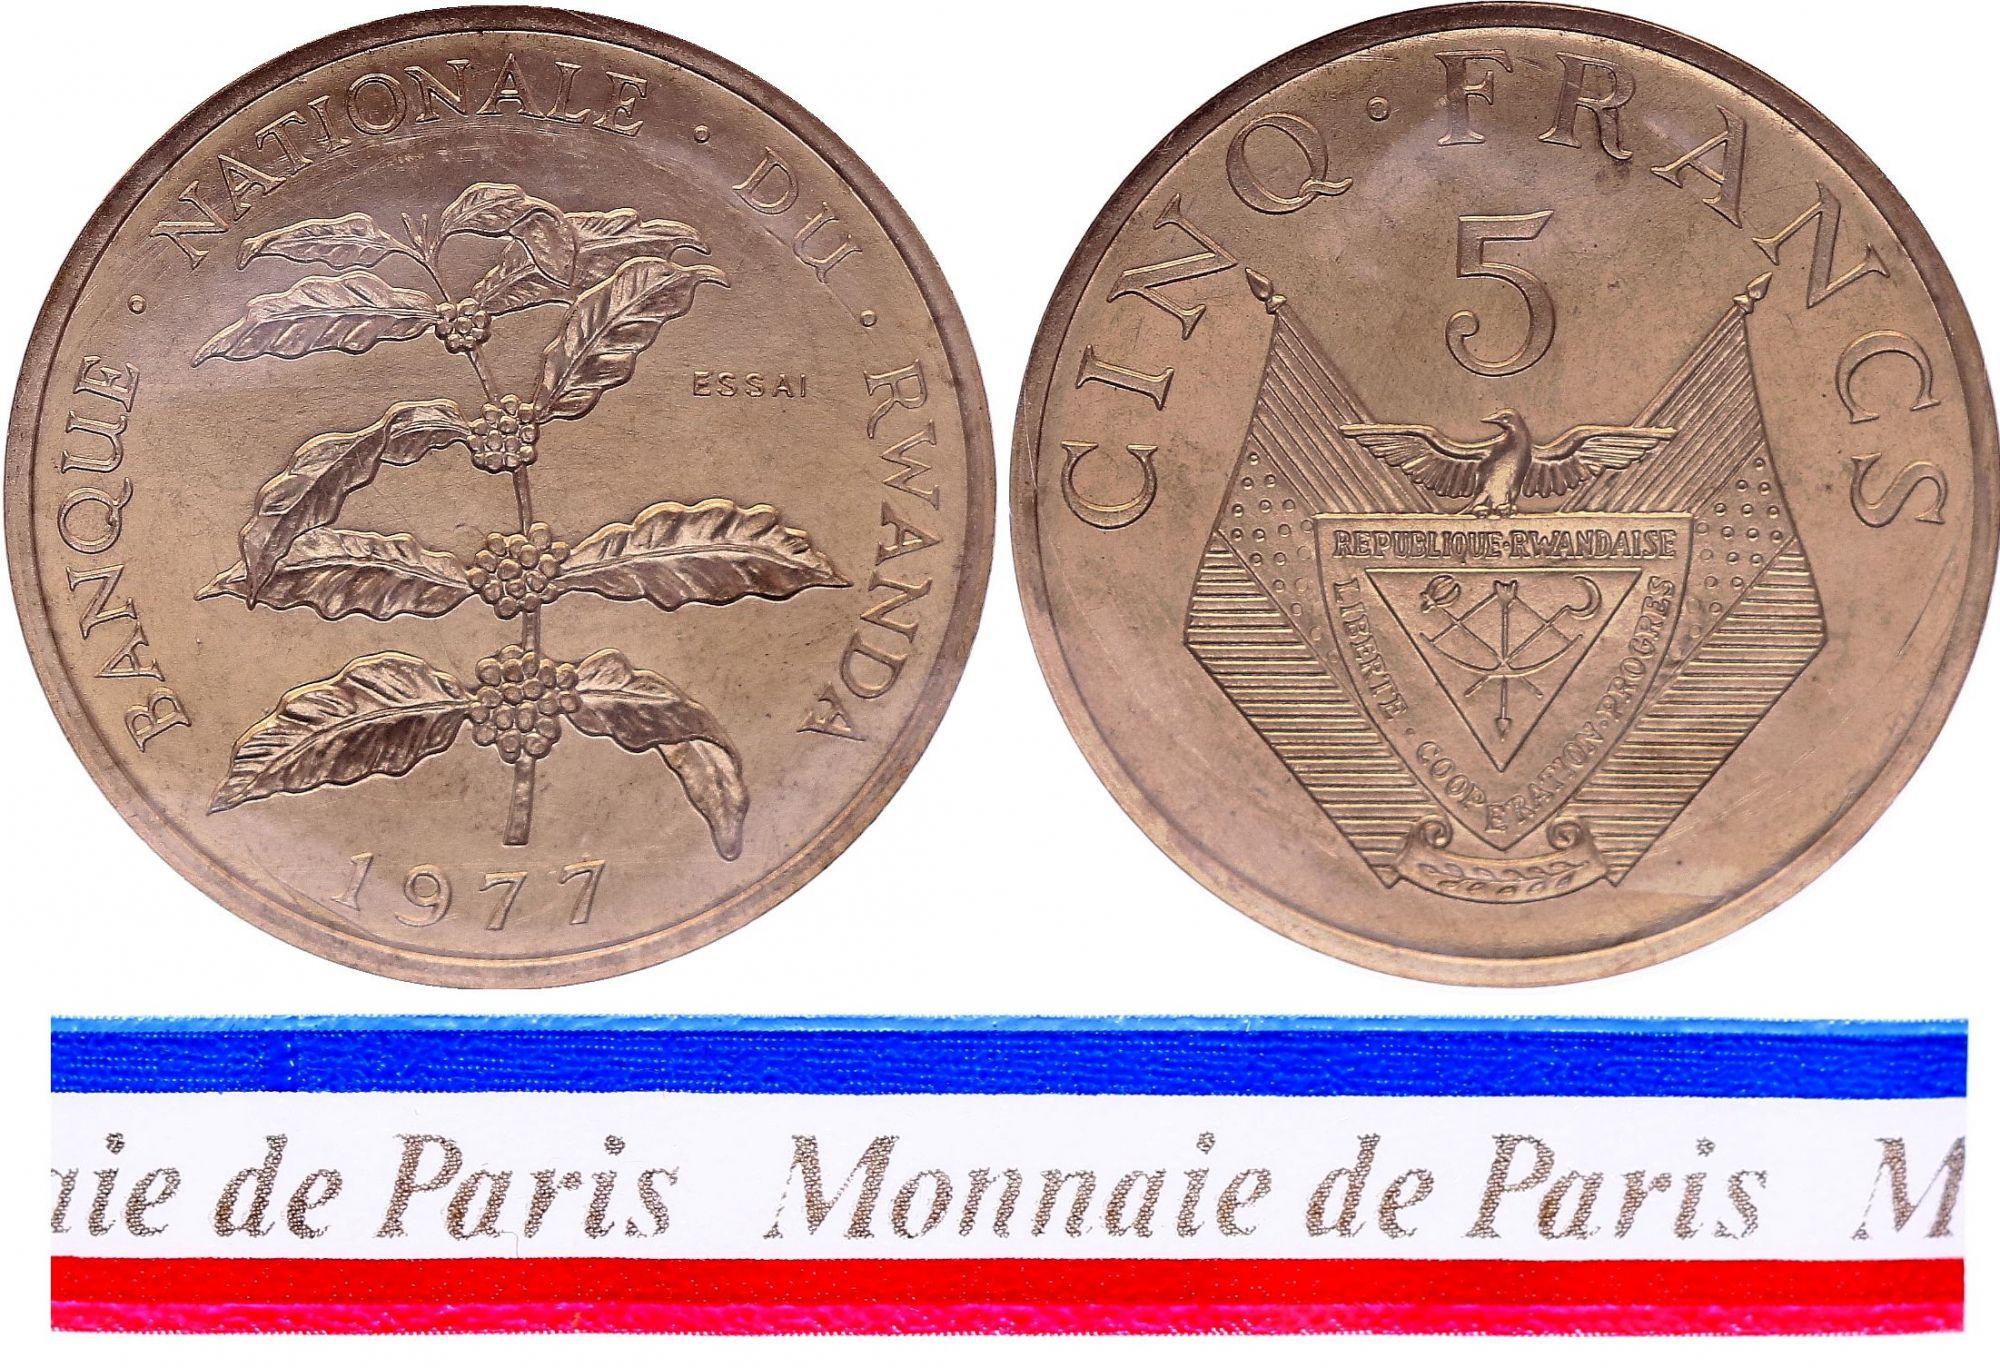 Rwanda 5 Francs - 1977 - Test strike - National Bank of Rwanda